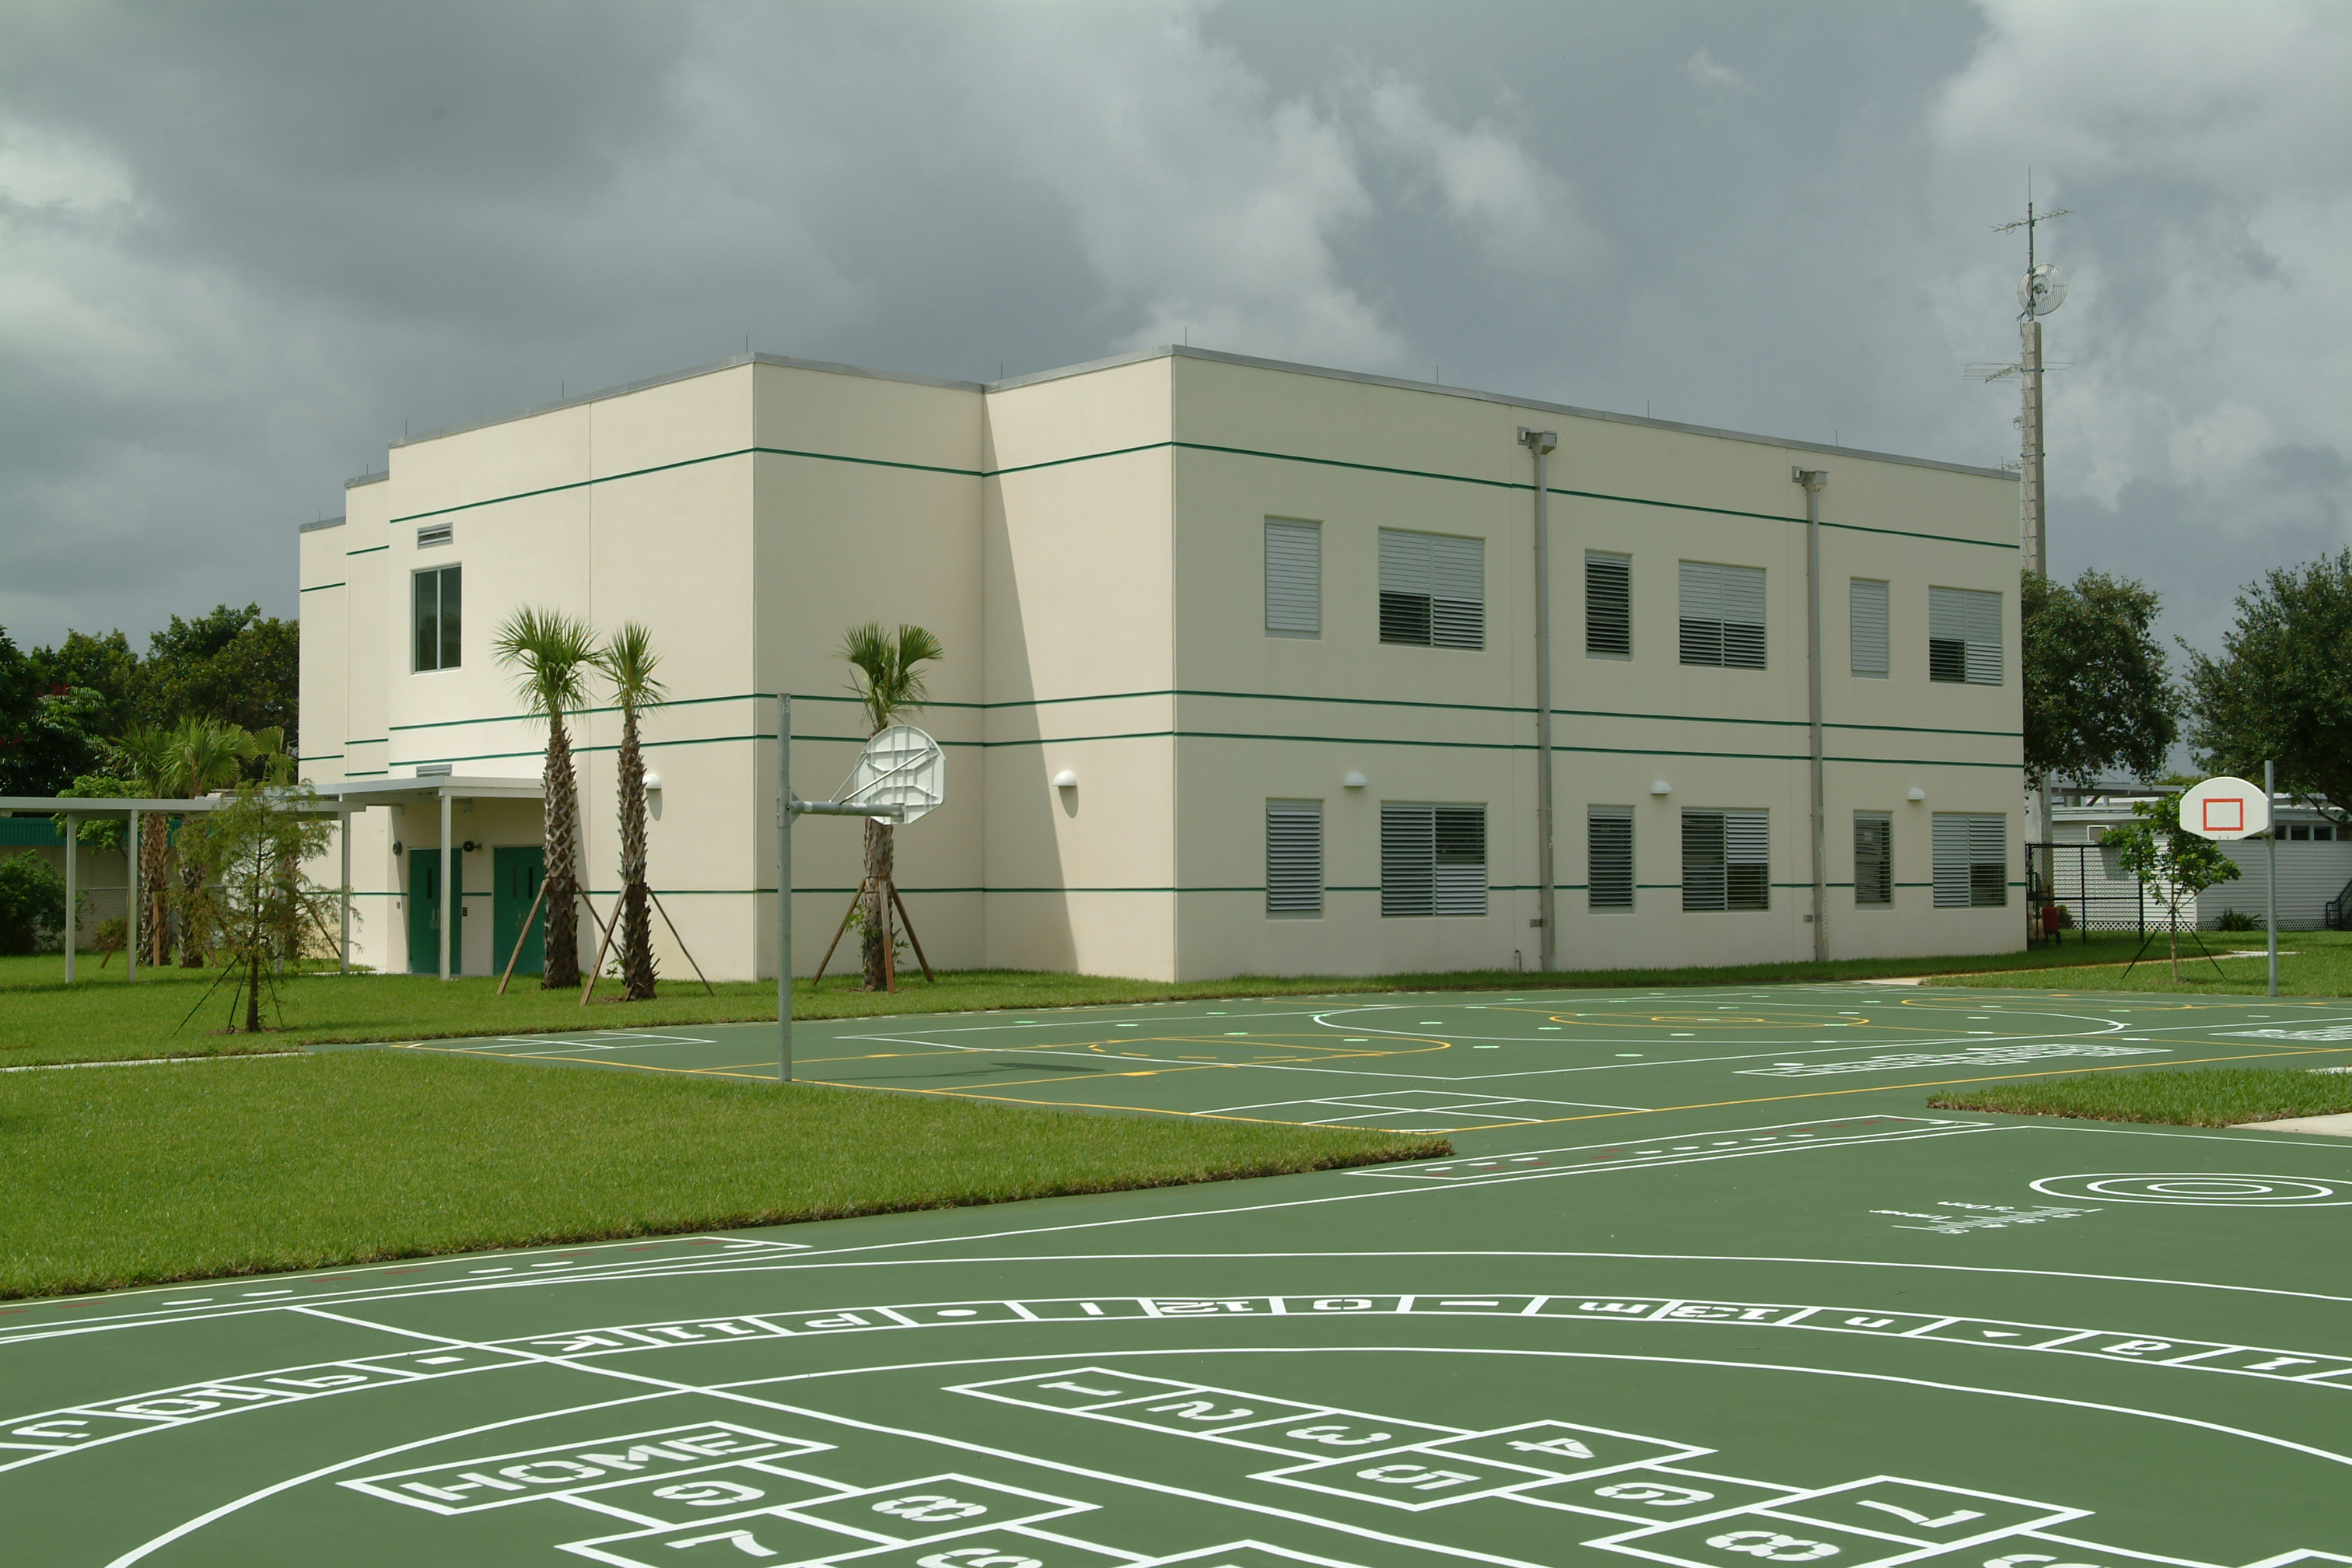 Stephen Foster Elementary School